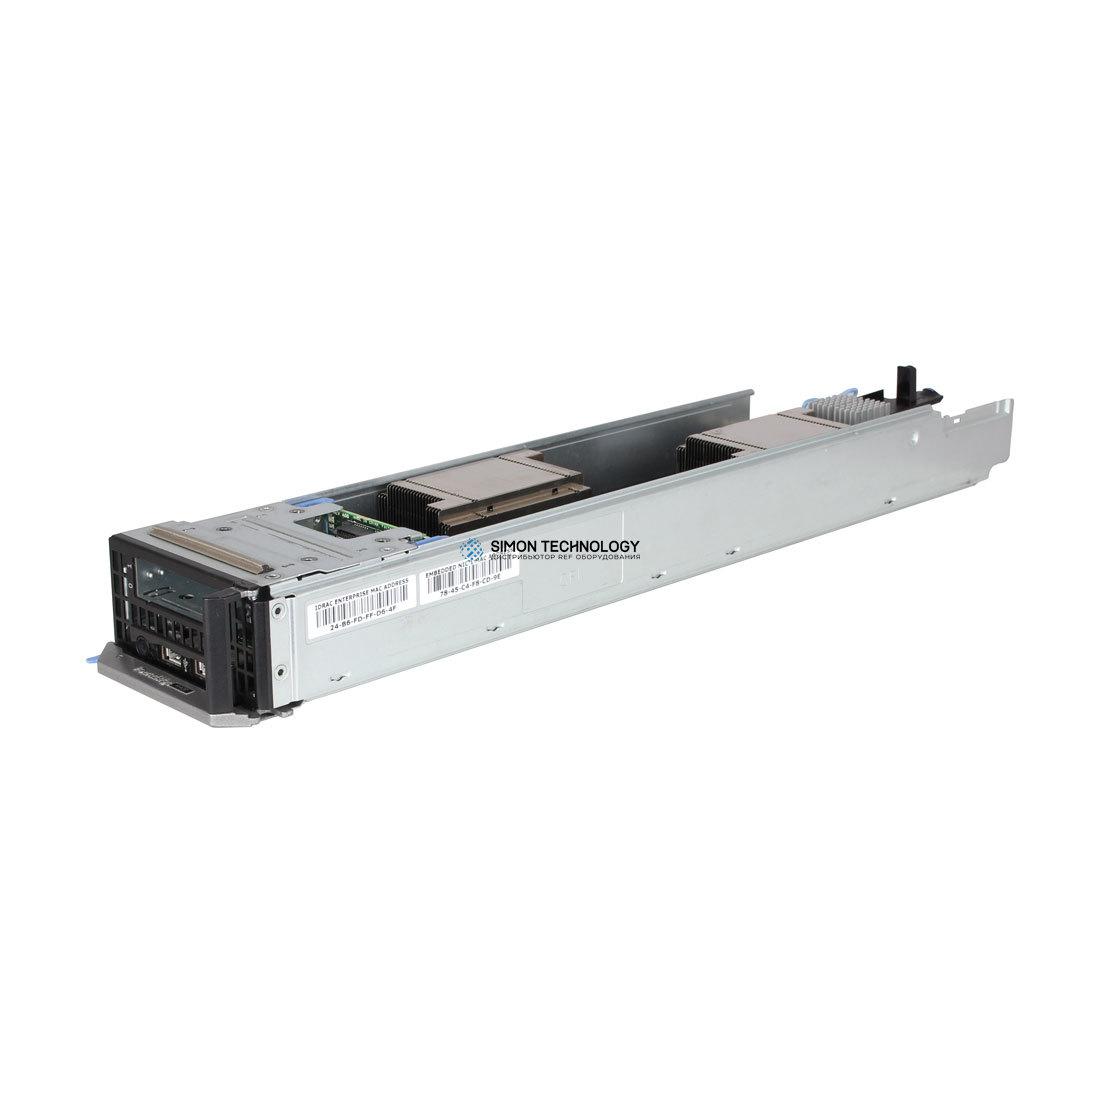 Сервер Dell PEM420 E5-2420 2P 32GB H310 BLADE SERVER (M420-E5-2420)